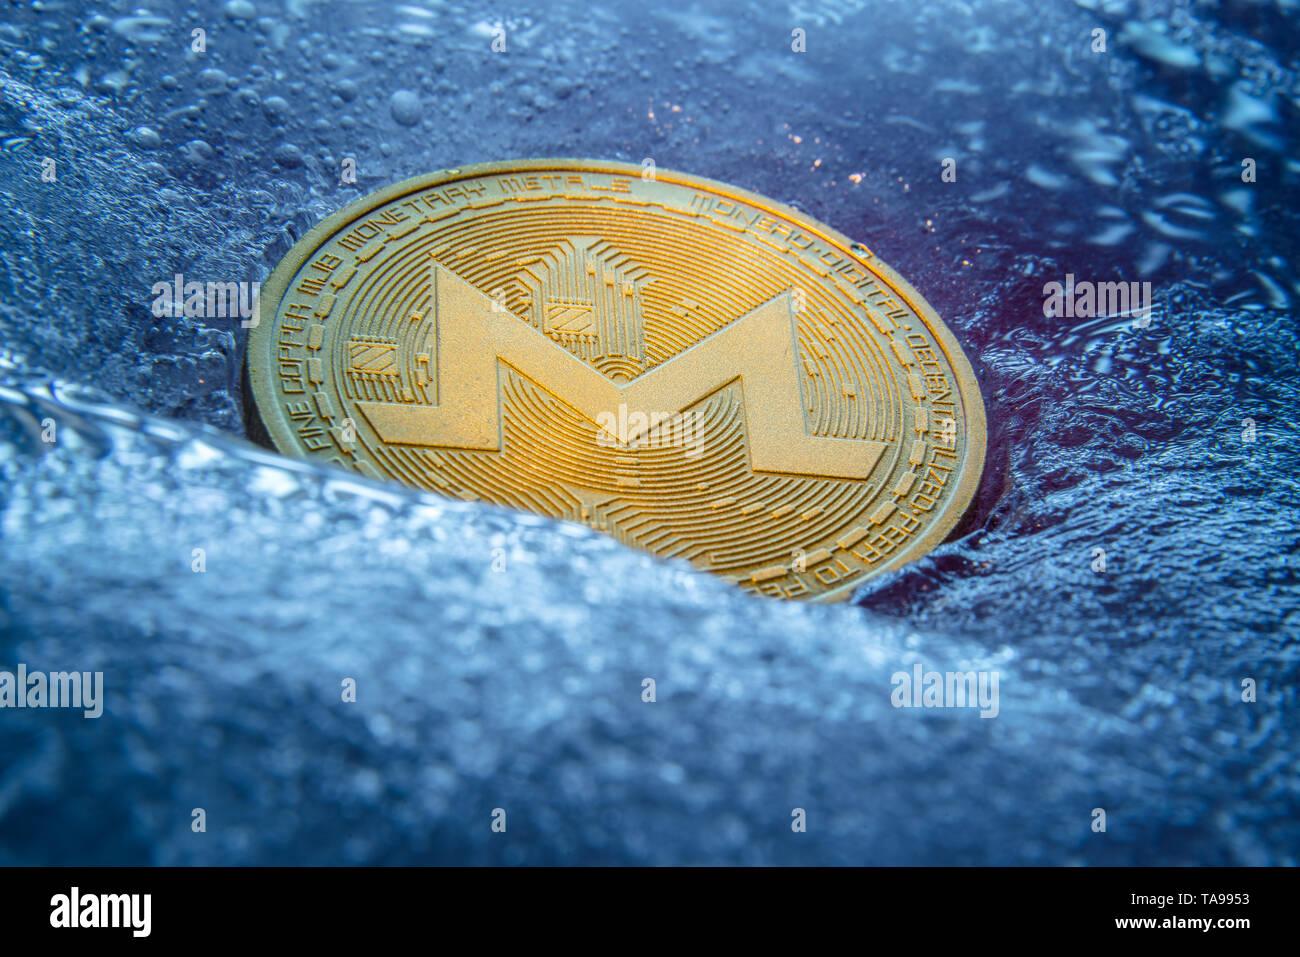 Golden Monero coin, online digital currency frozen in the blue ice. Concept of block chain, crypto market crash. Frozen crypto money, depreciation - Stock Image